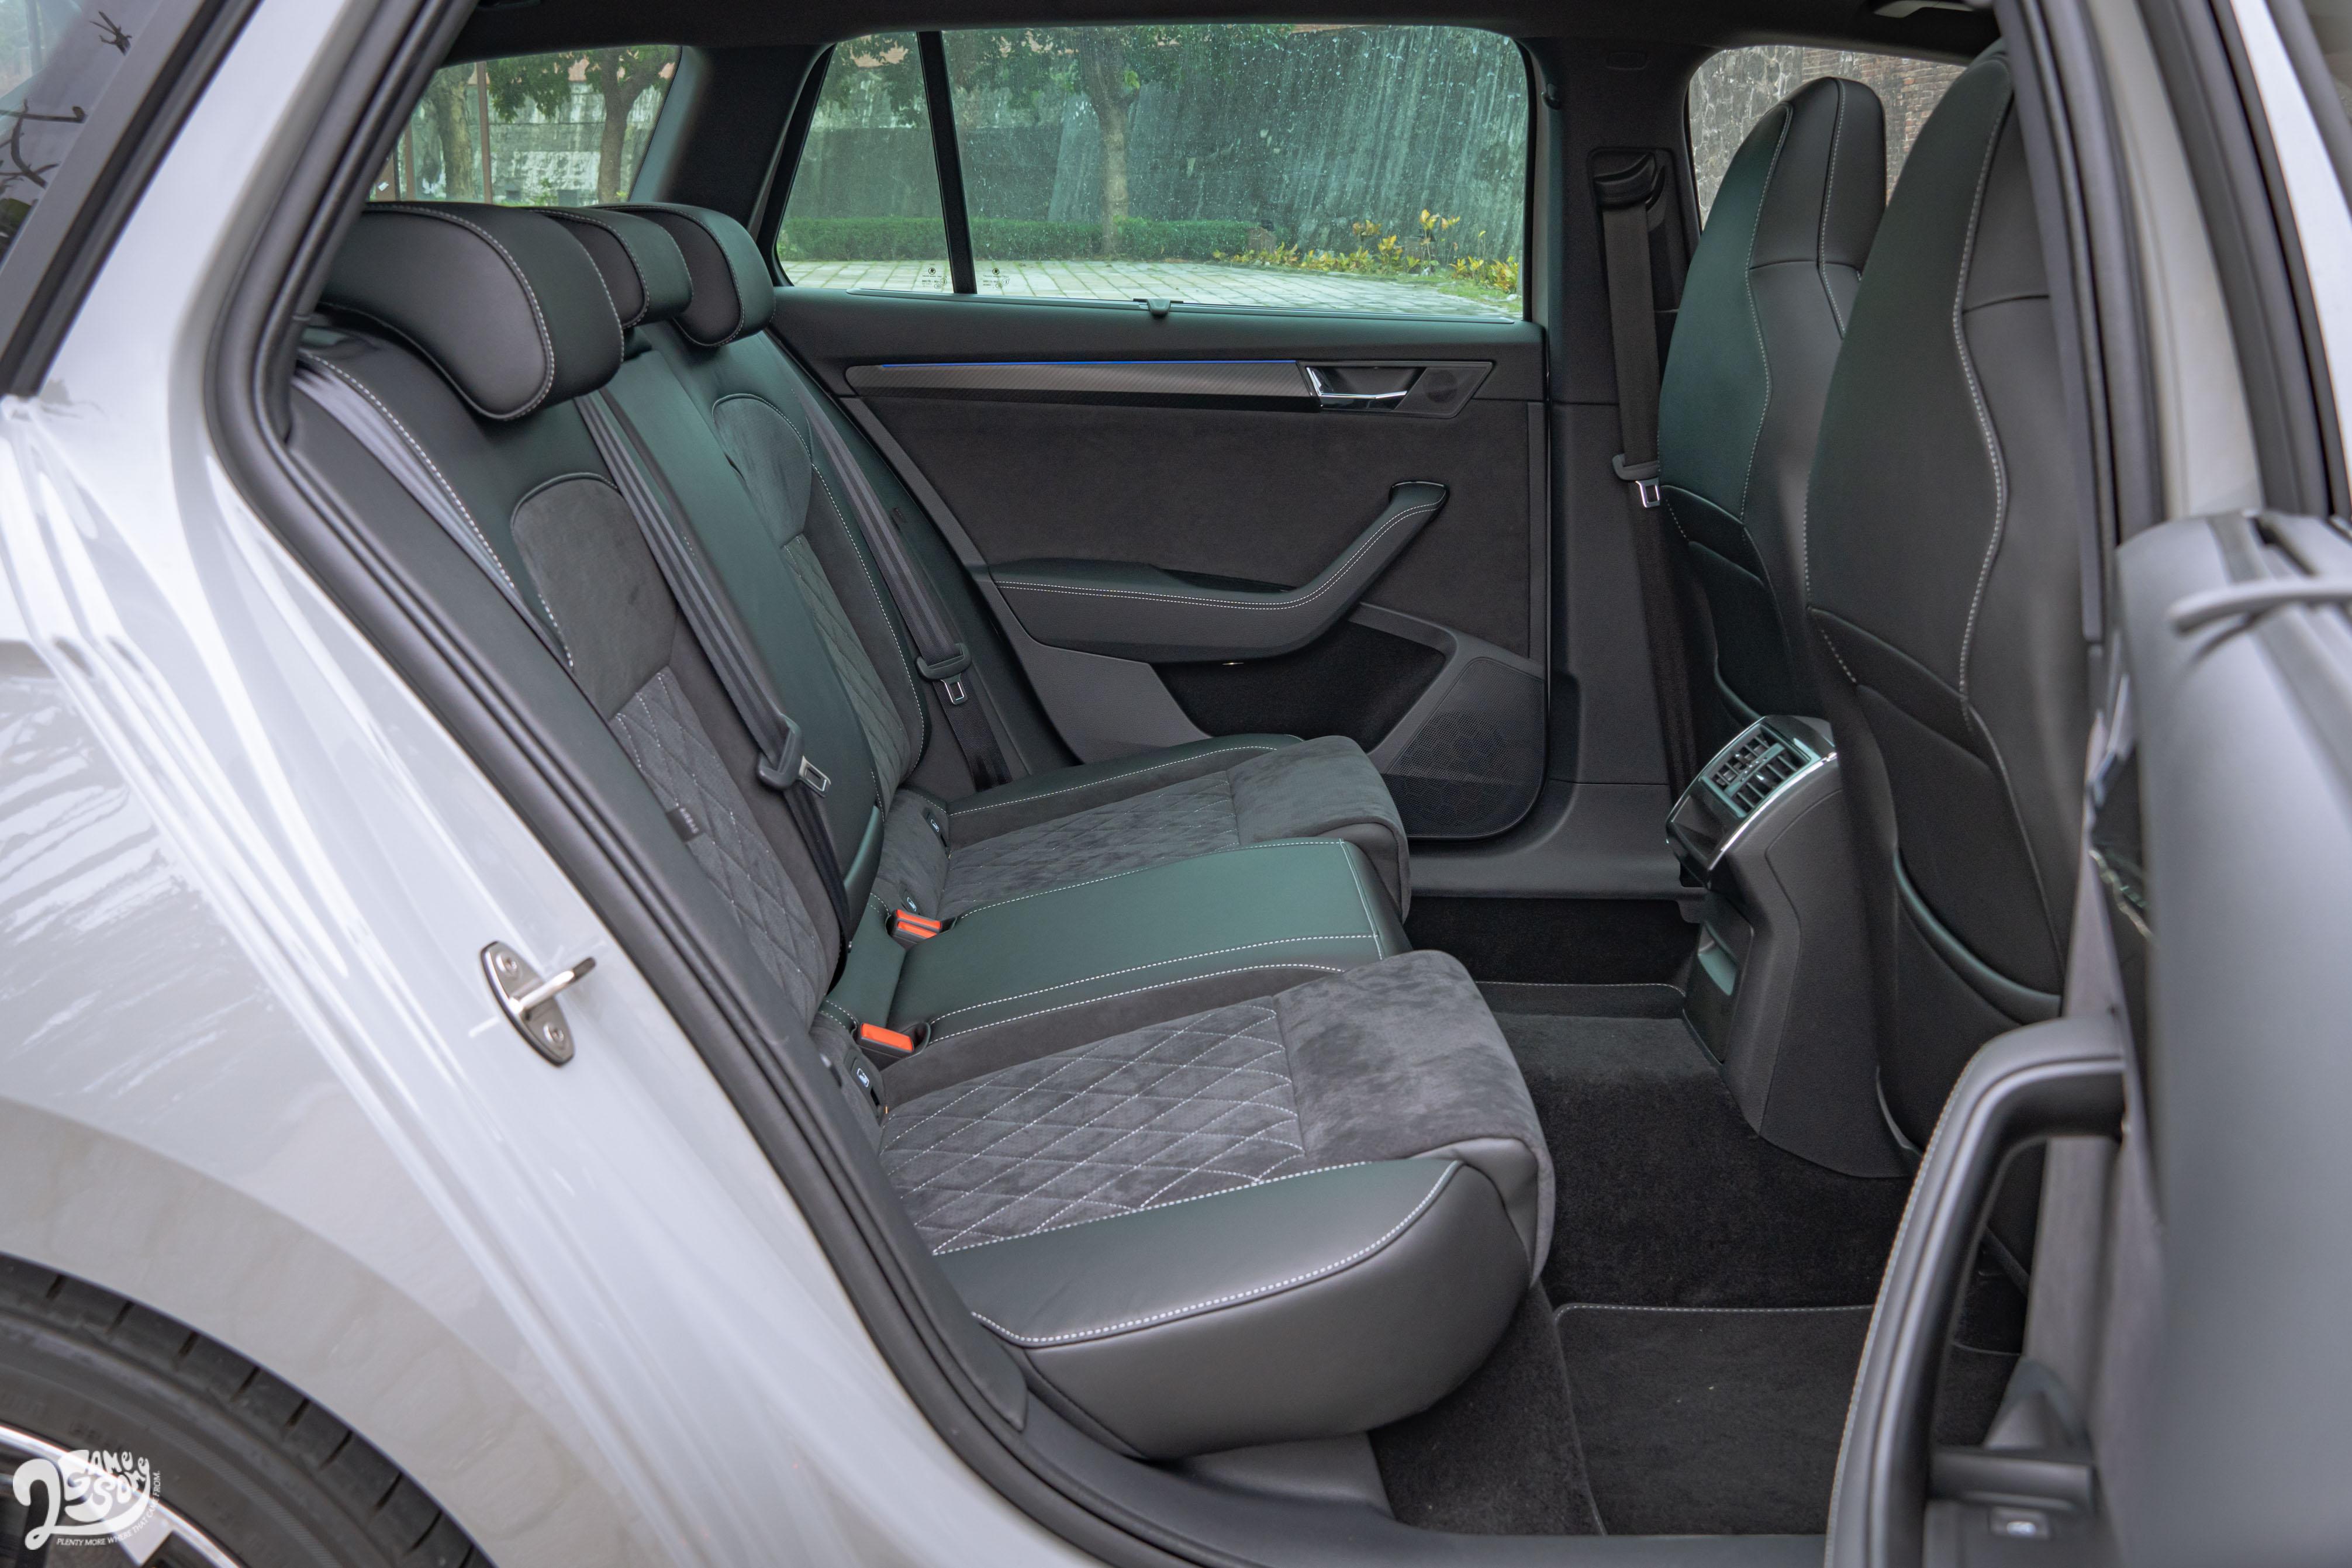 Combi 與 Limo 共享 2.8 米的軸距,乘坐在後座一點也不拘束,膝部空間也不需要用幾個拳頭去計較;但礙於四驅系統,中央隆起難免犧牲第五名車客的舒適。